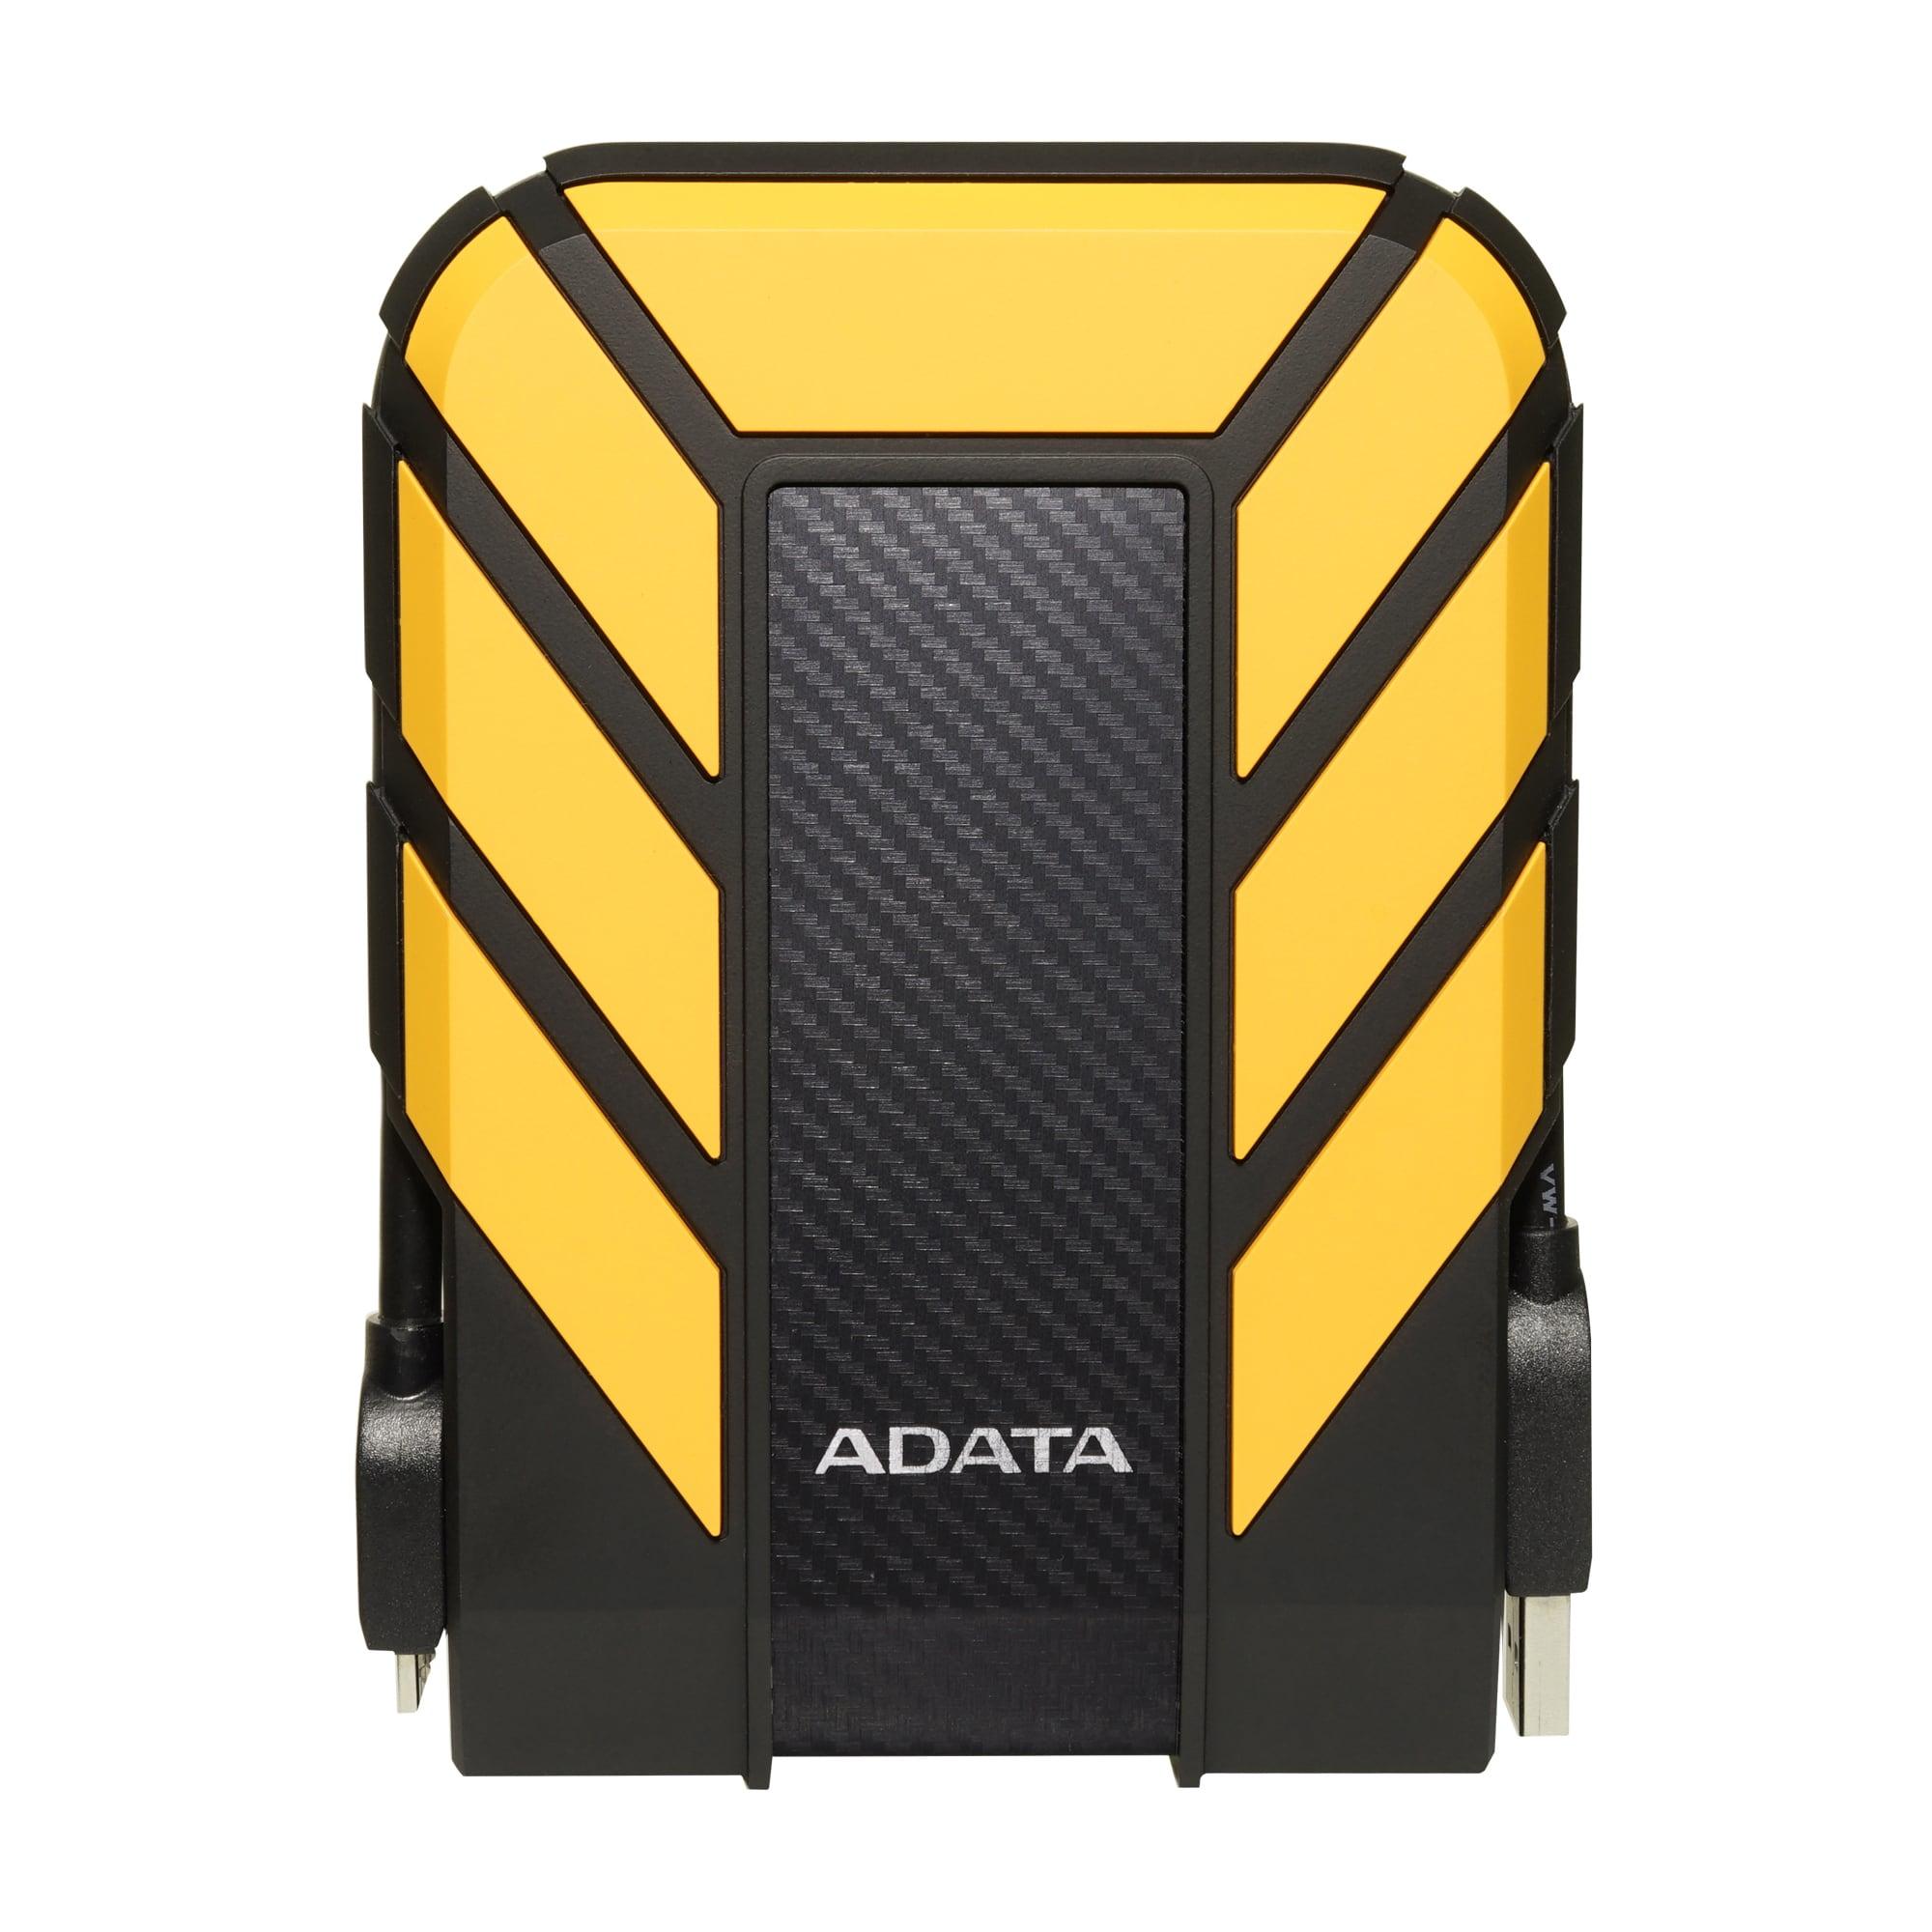 ADATA HD710 Pro external hard drive 4000 GB Black,Yellow